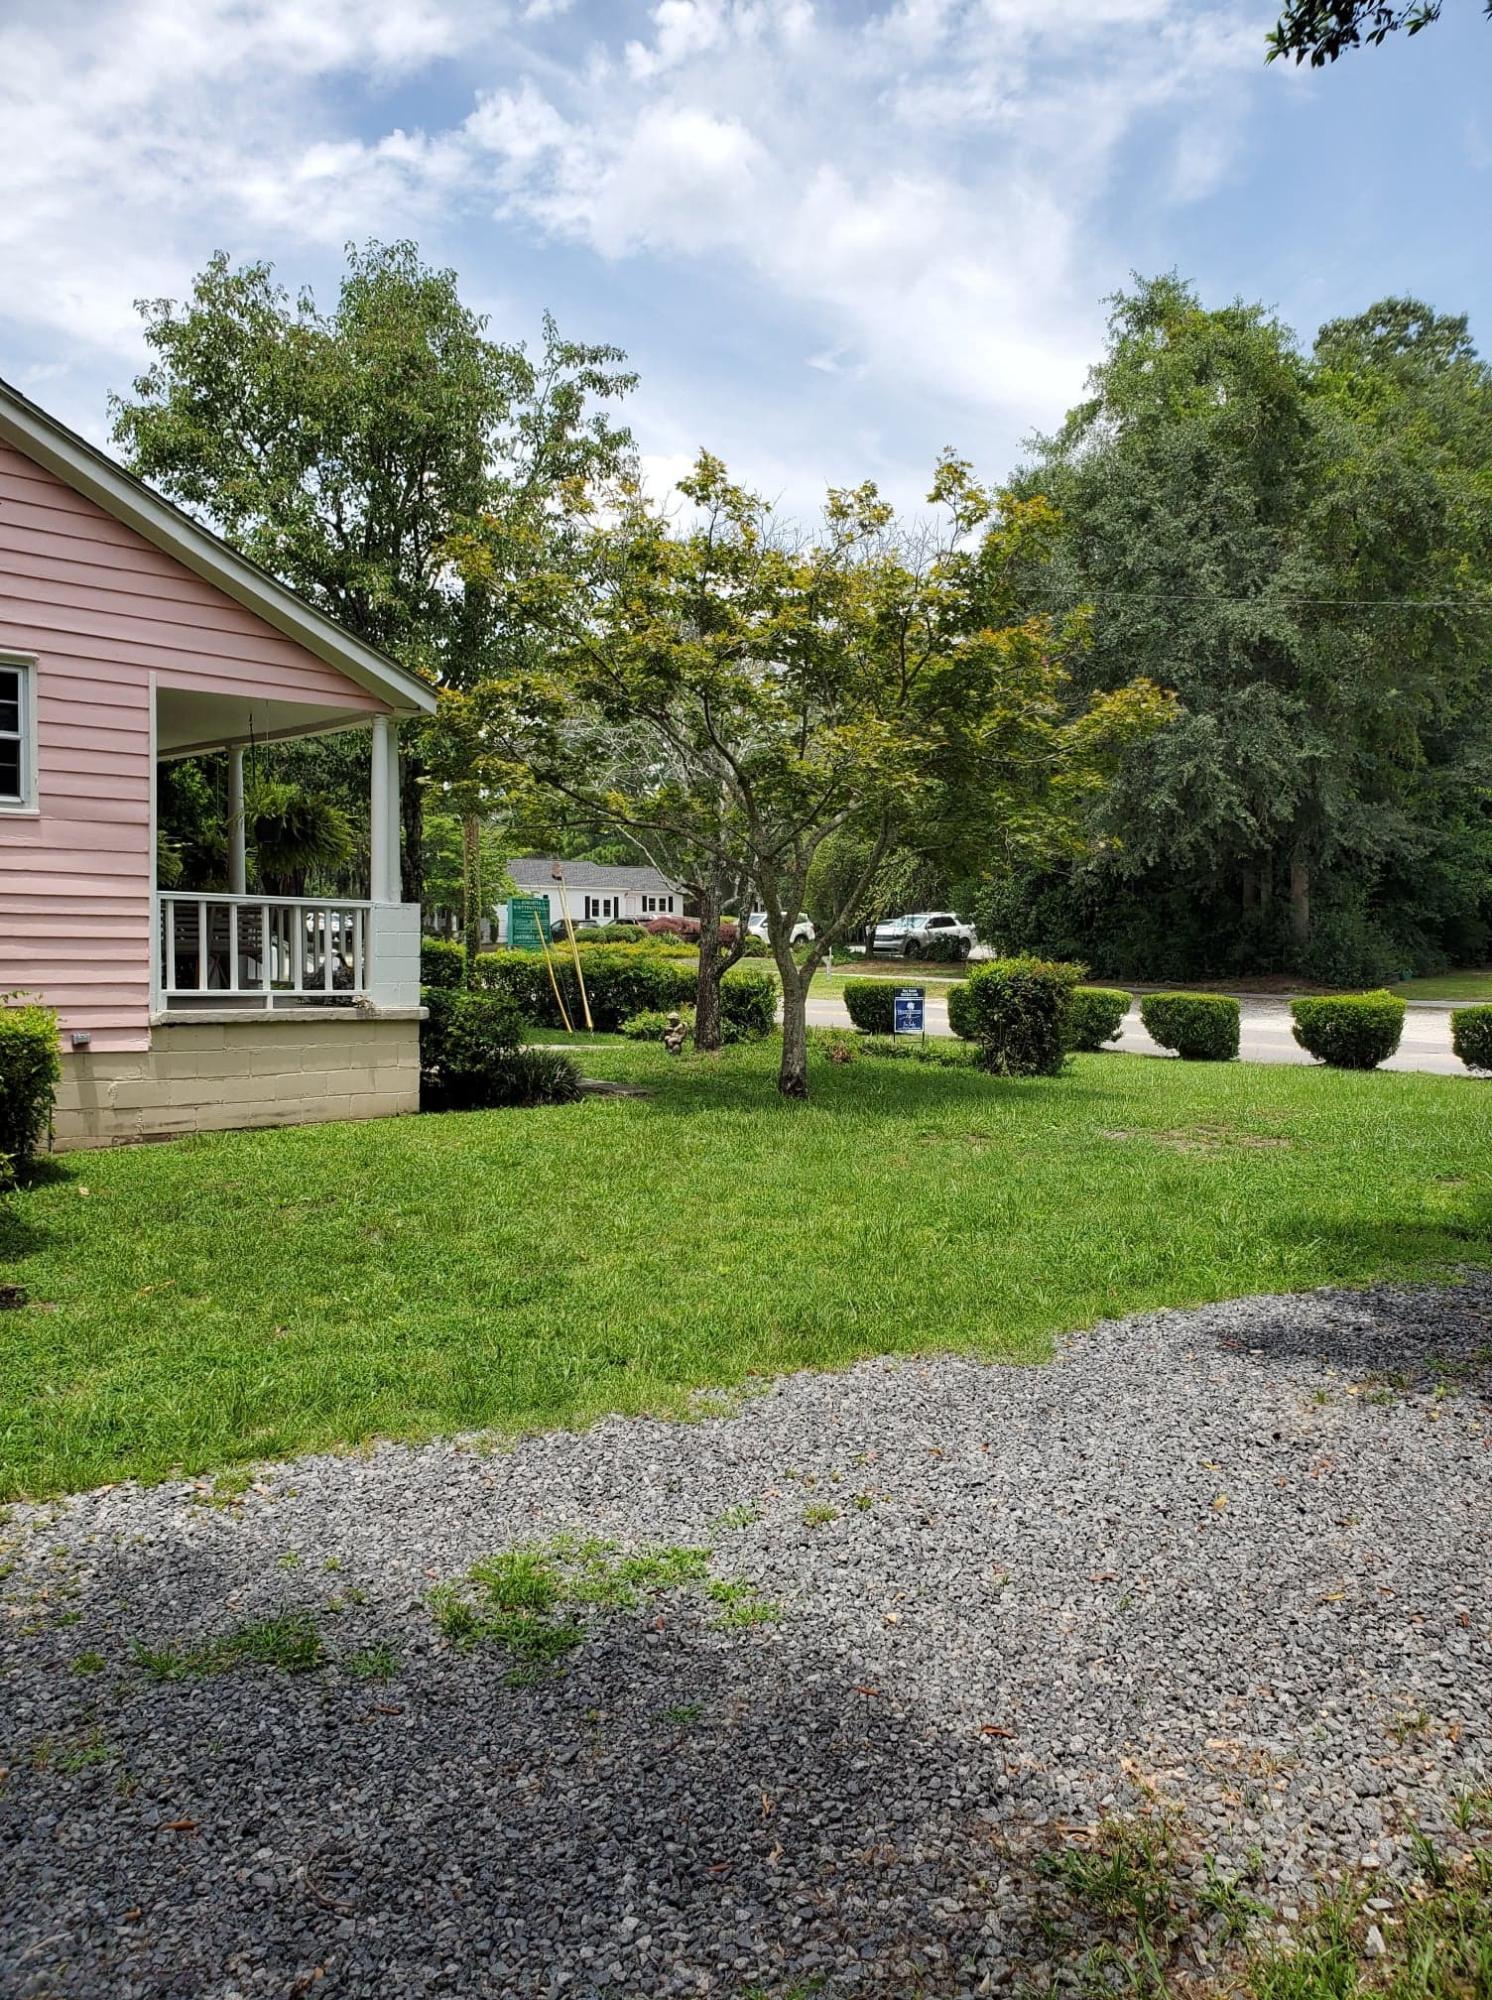 Summerville Homes For Sale - 208 3rd North, Summerville, SC - 1